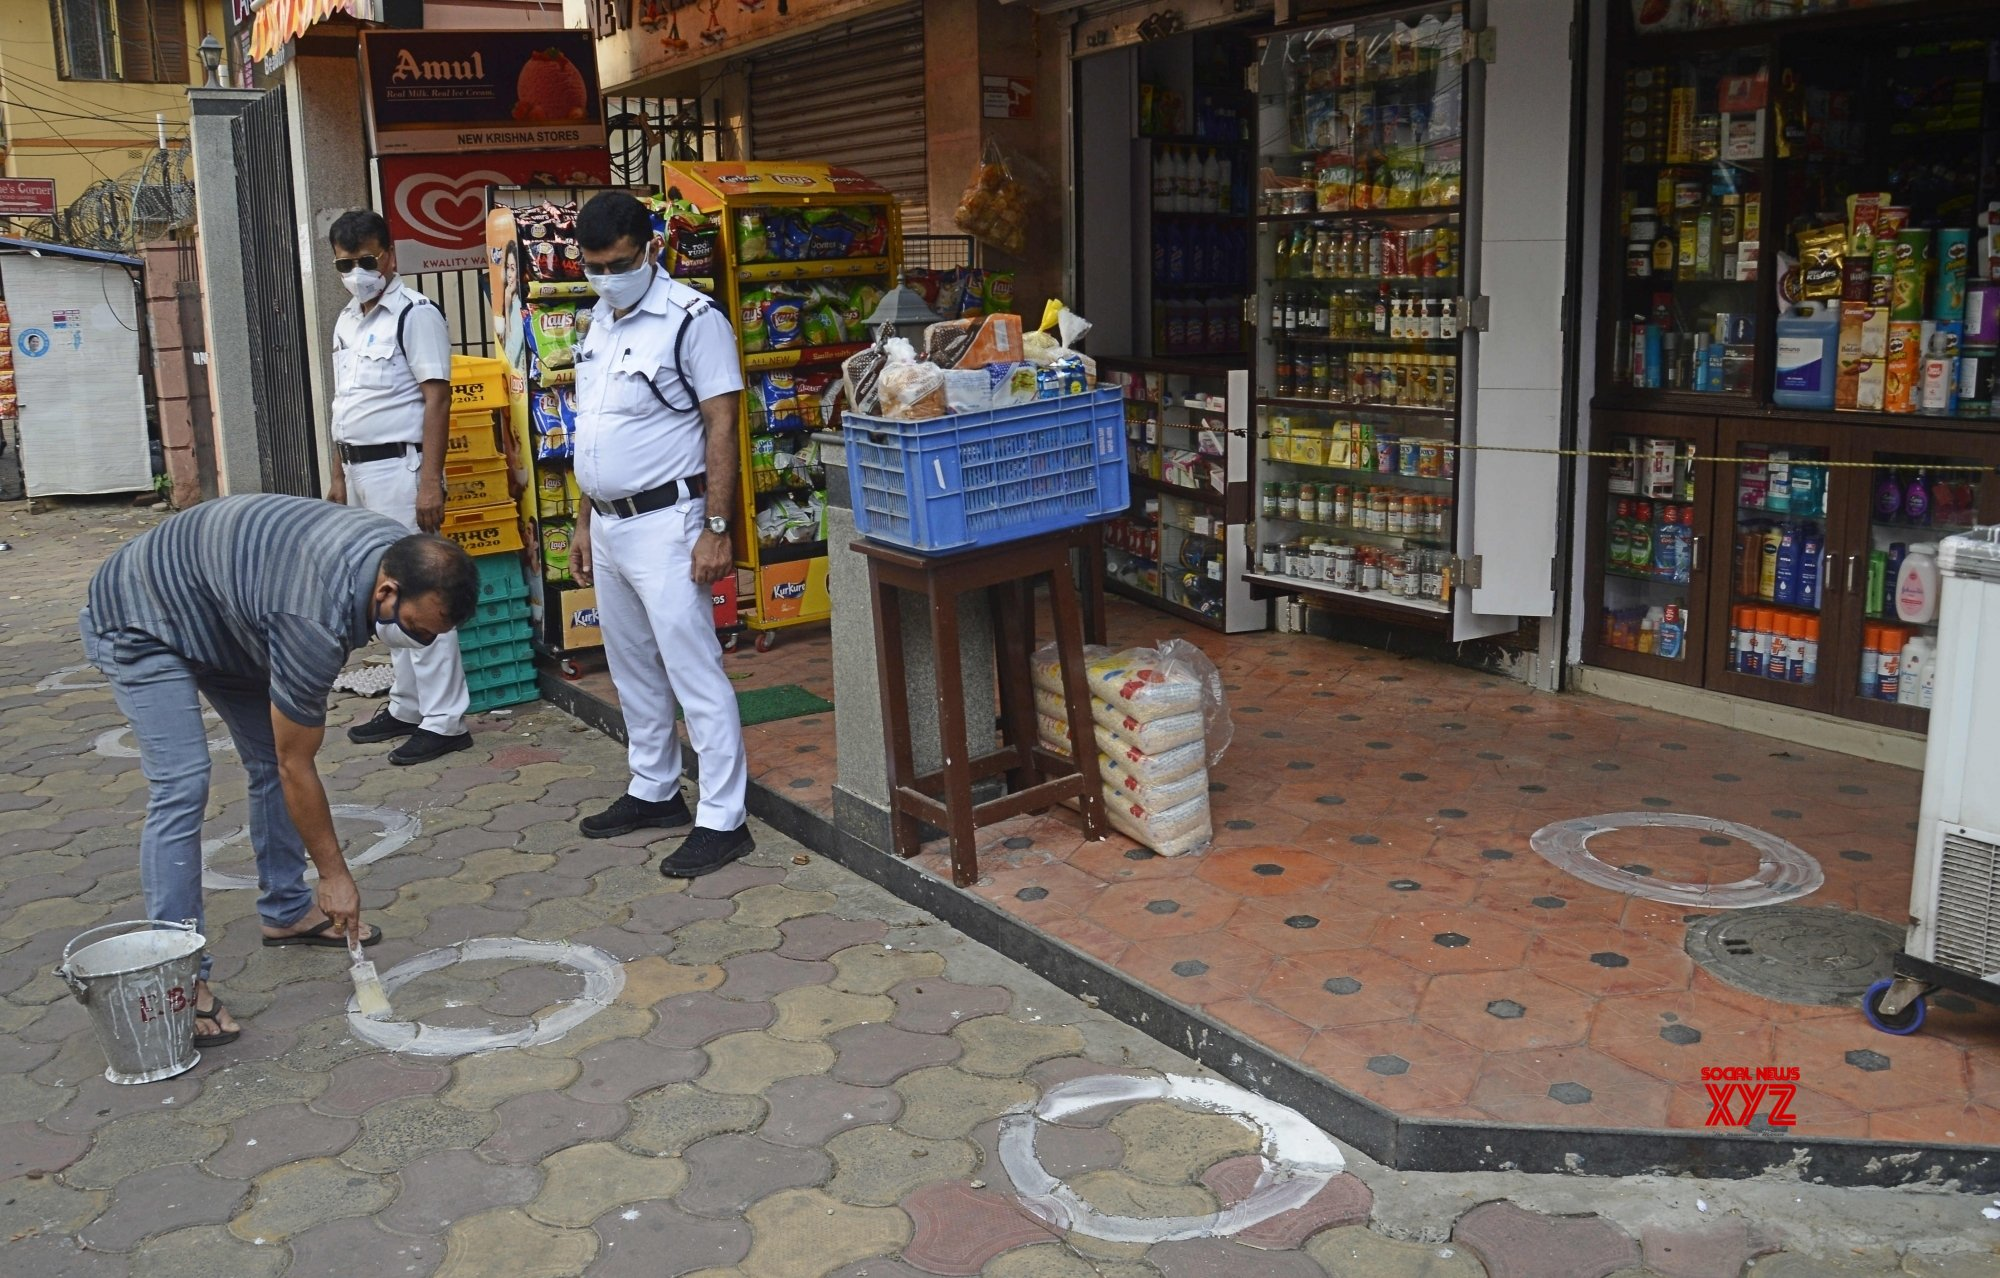 Kolkata: Worker marking a circle for customers social distancing in front of shops during the coronavirus pandemic in Kolkata. #Gallery